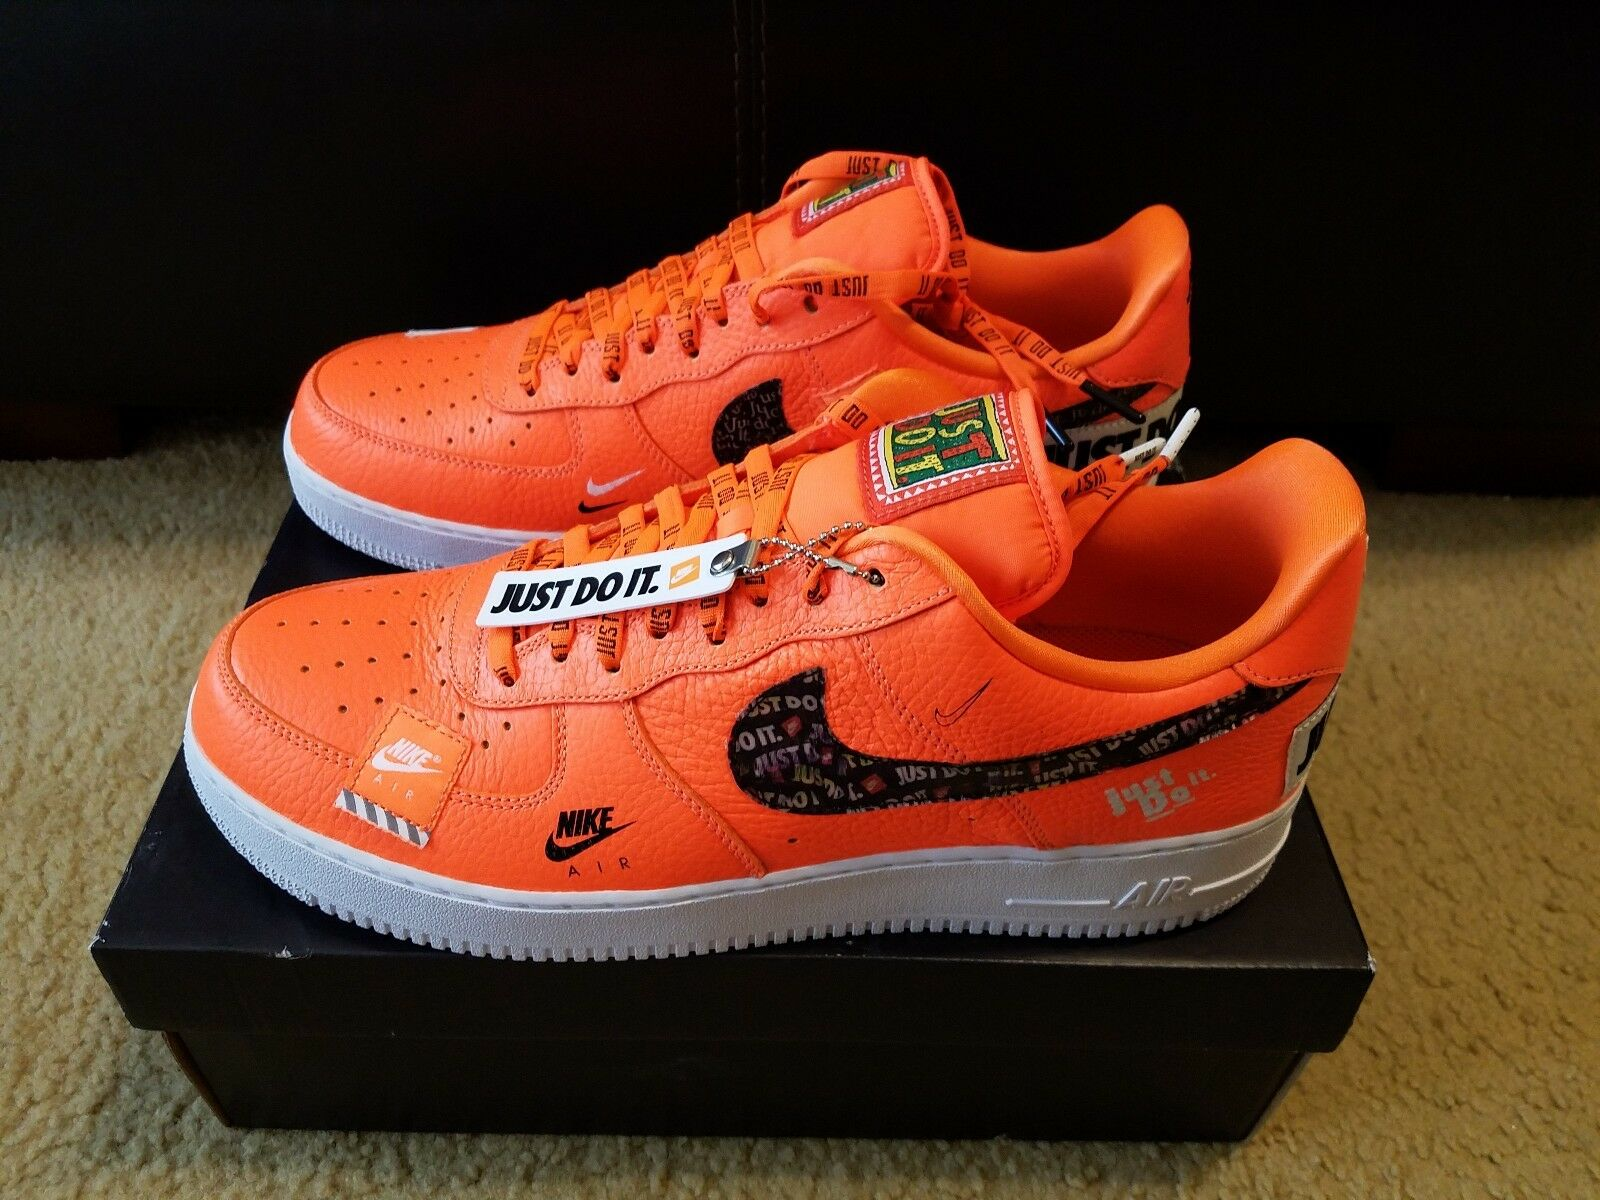 Nike Air Force 1 '07 Premium JDI Just Do It Uomo sz 13 Total Orange AR7719 800